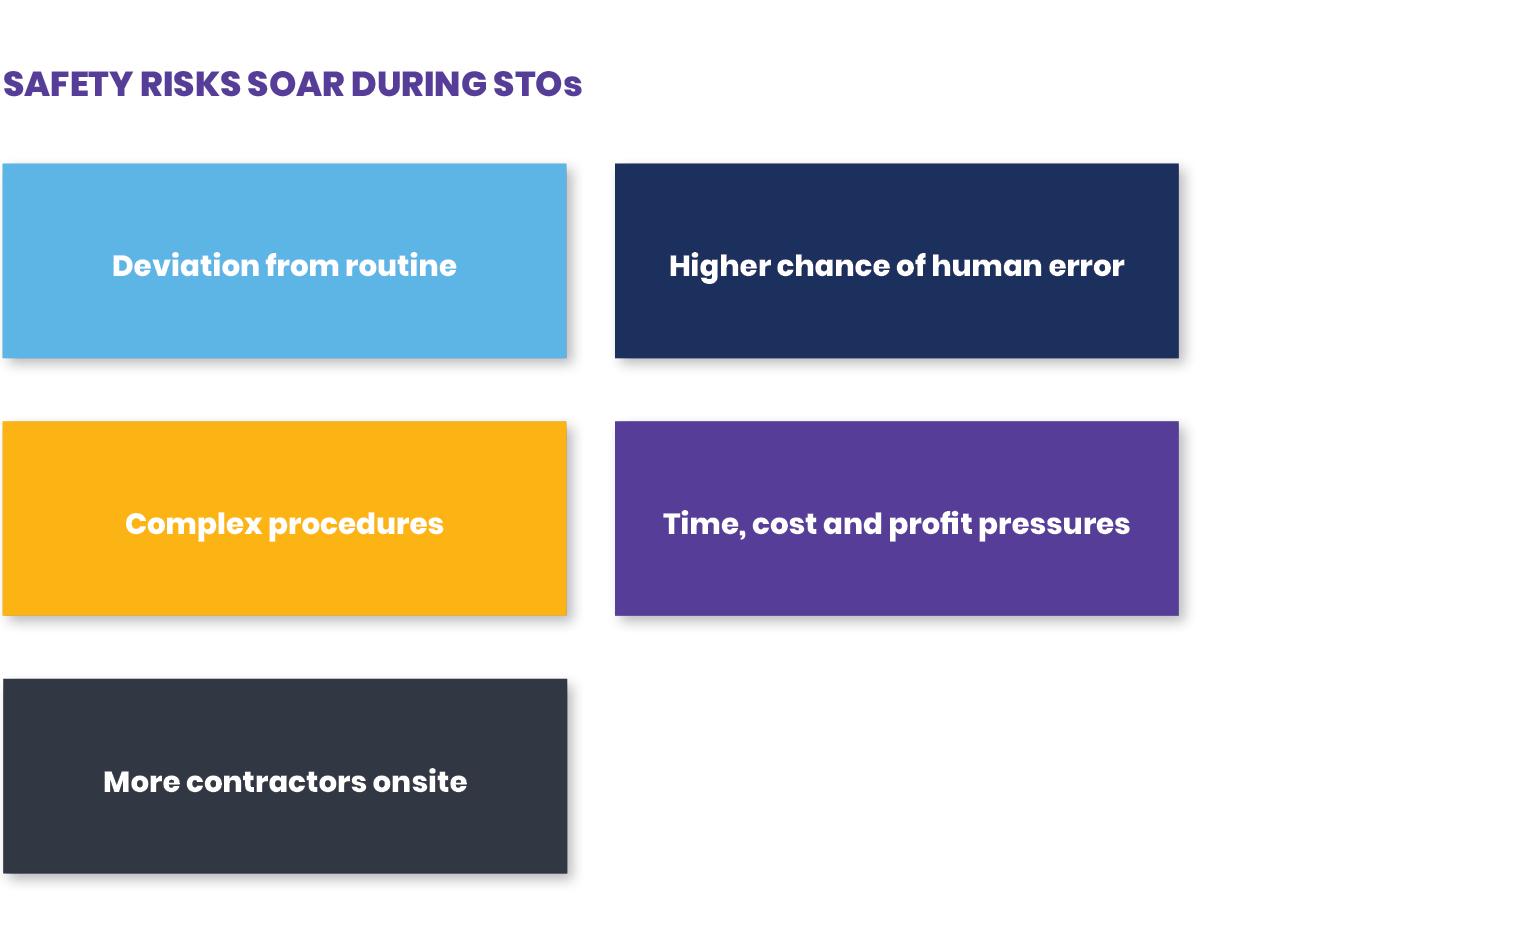 Safety Risks Soar During STOs chart